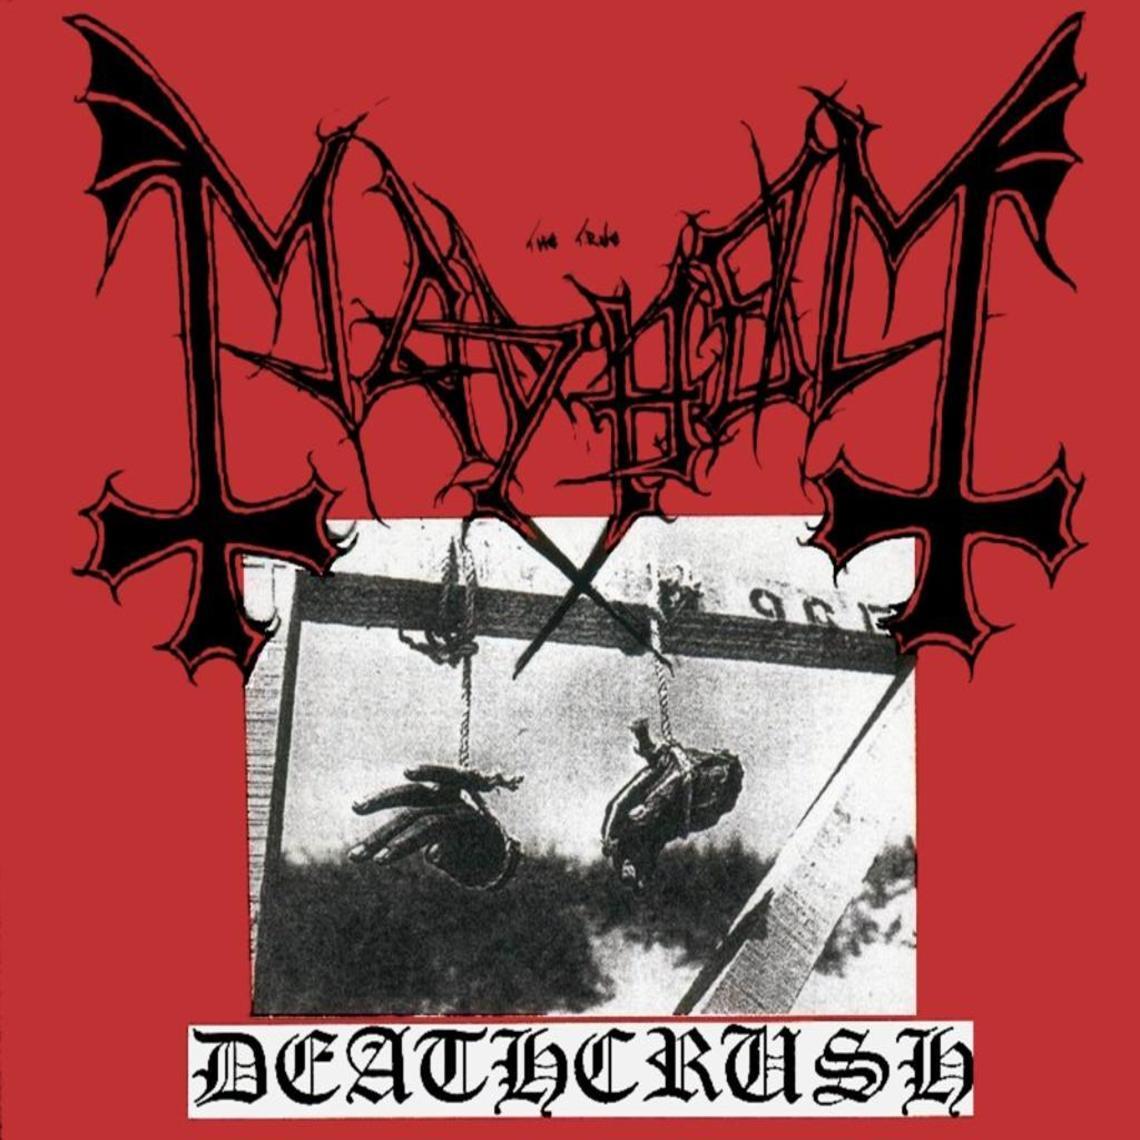 Mayhem Deathcrush | wallpaper | Pinterest